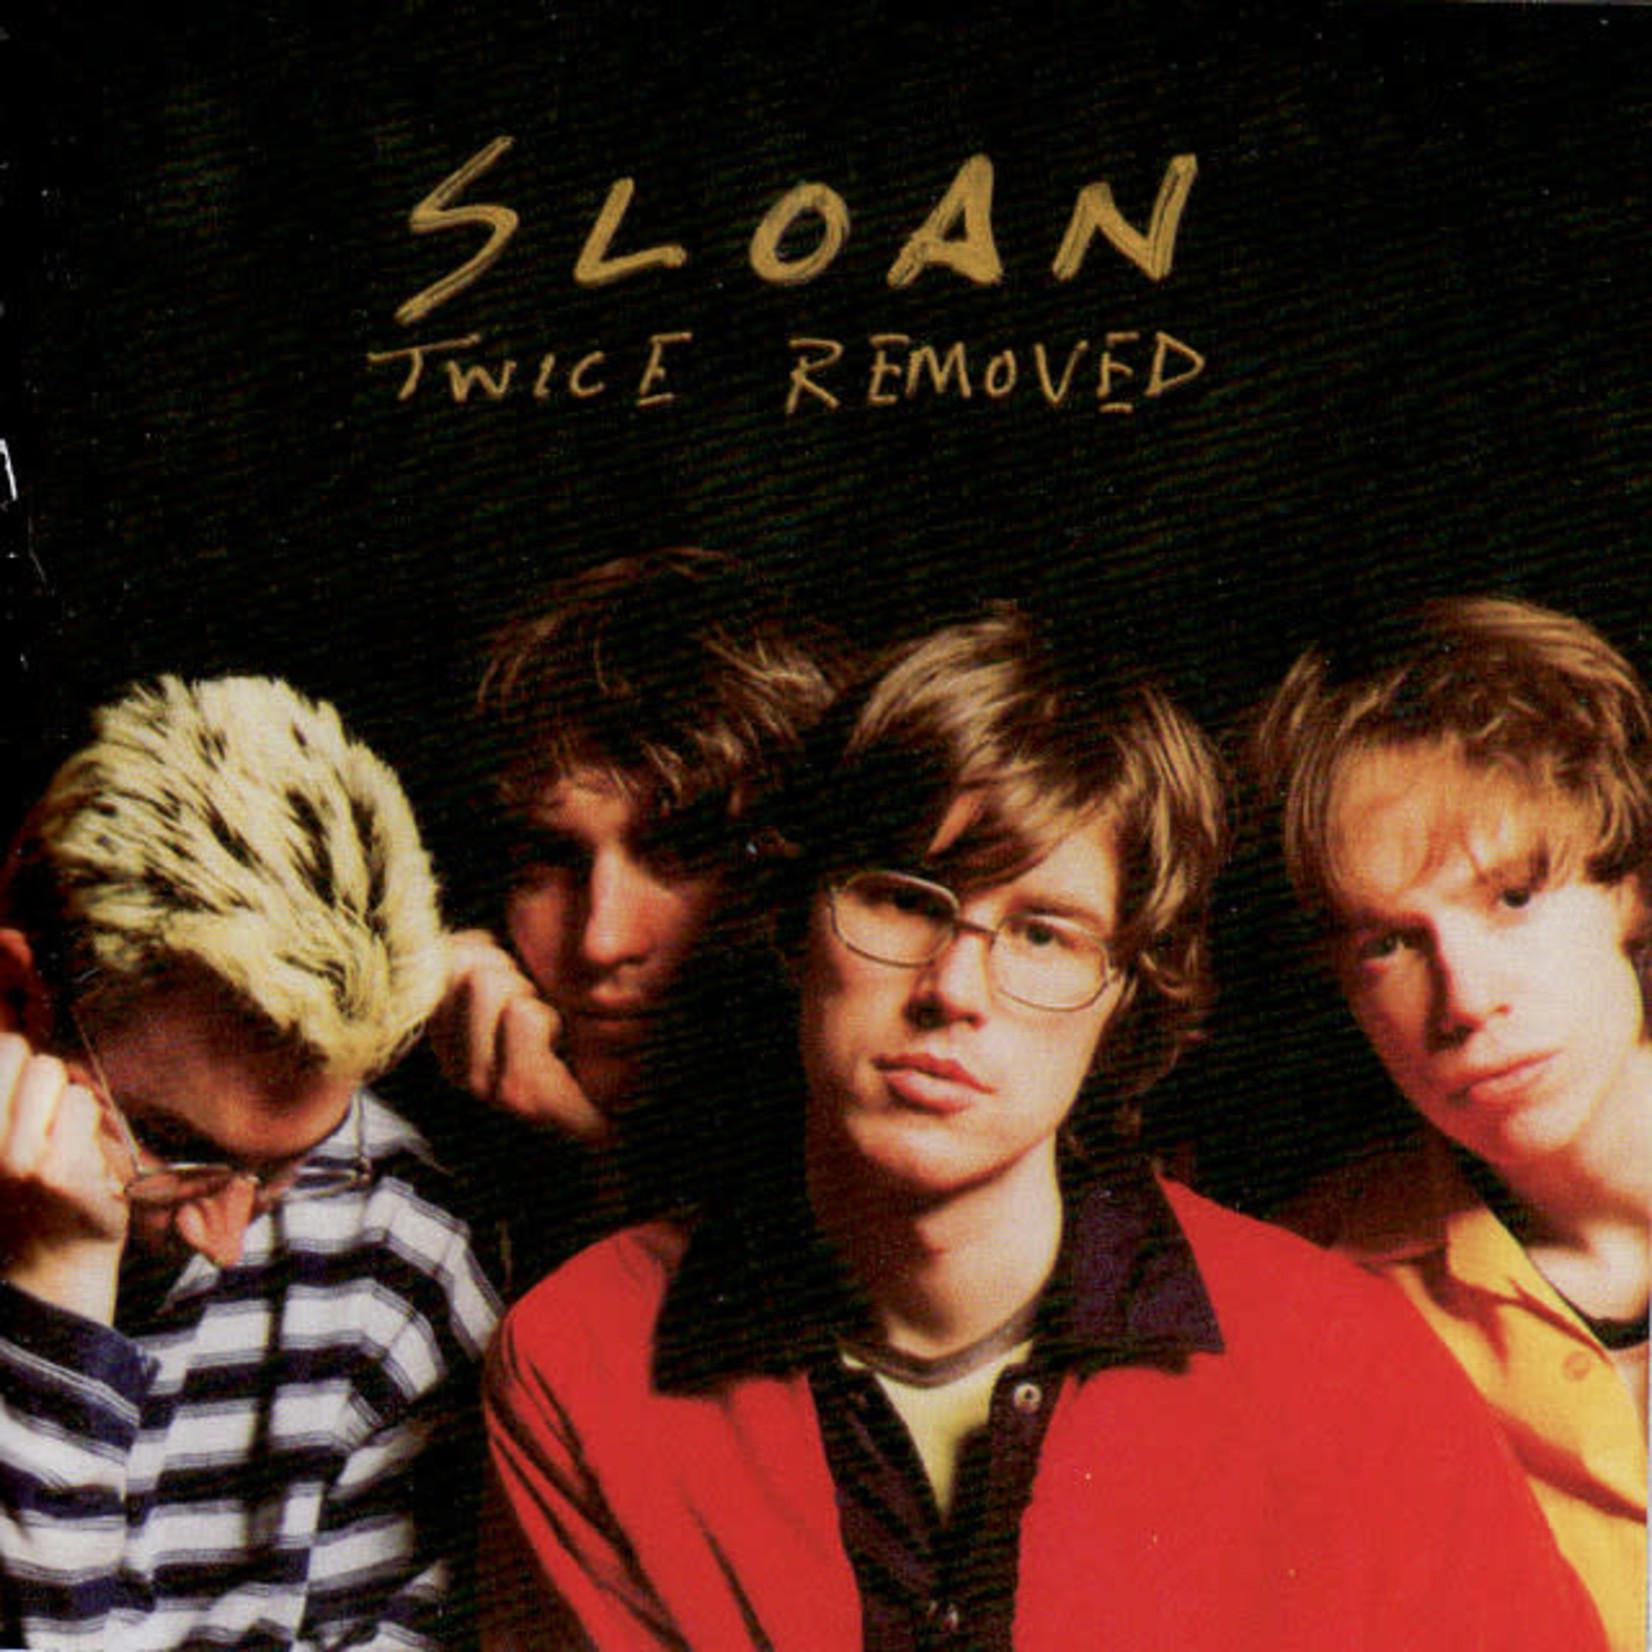 Vinyl Sloan - Twice Removed